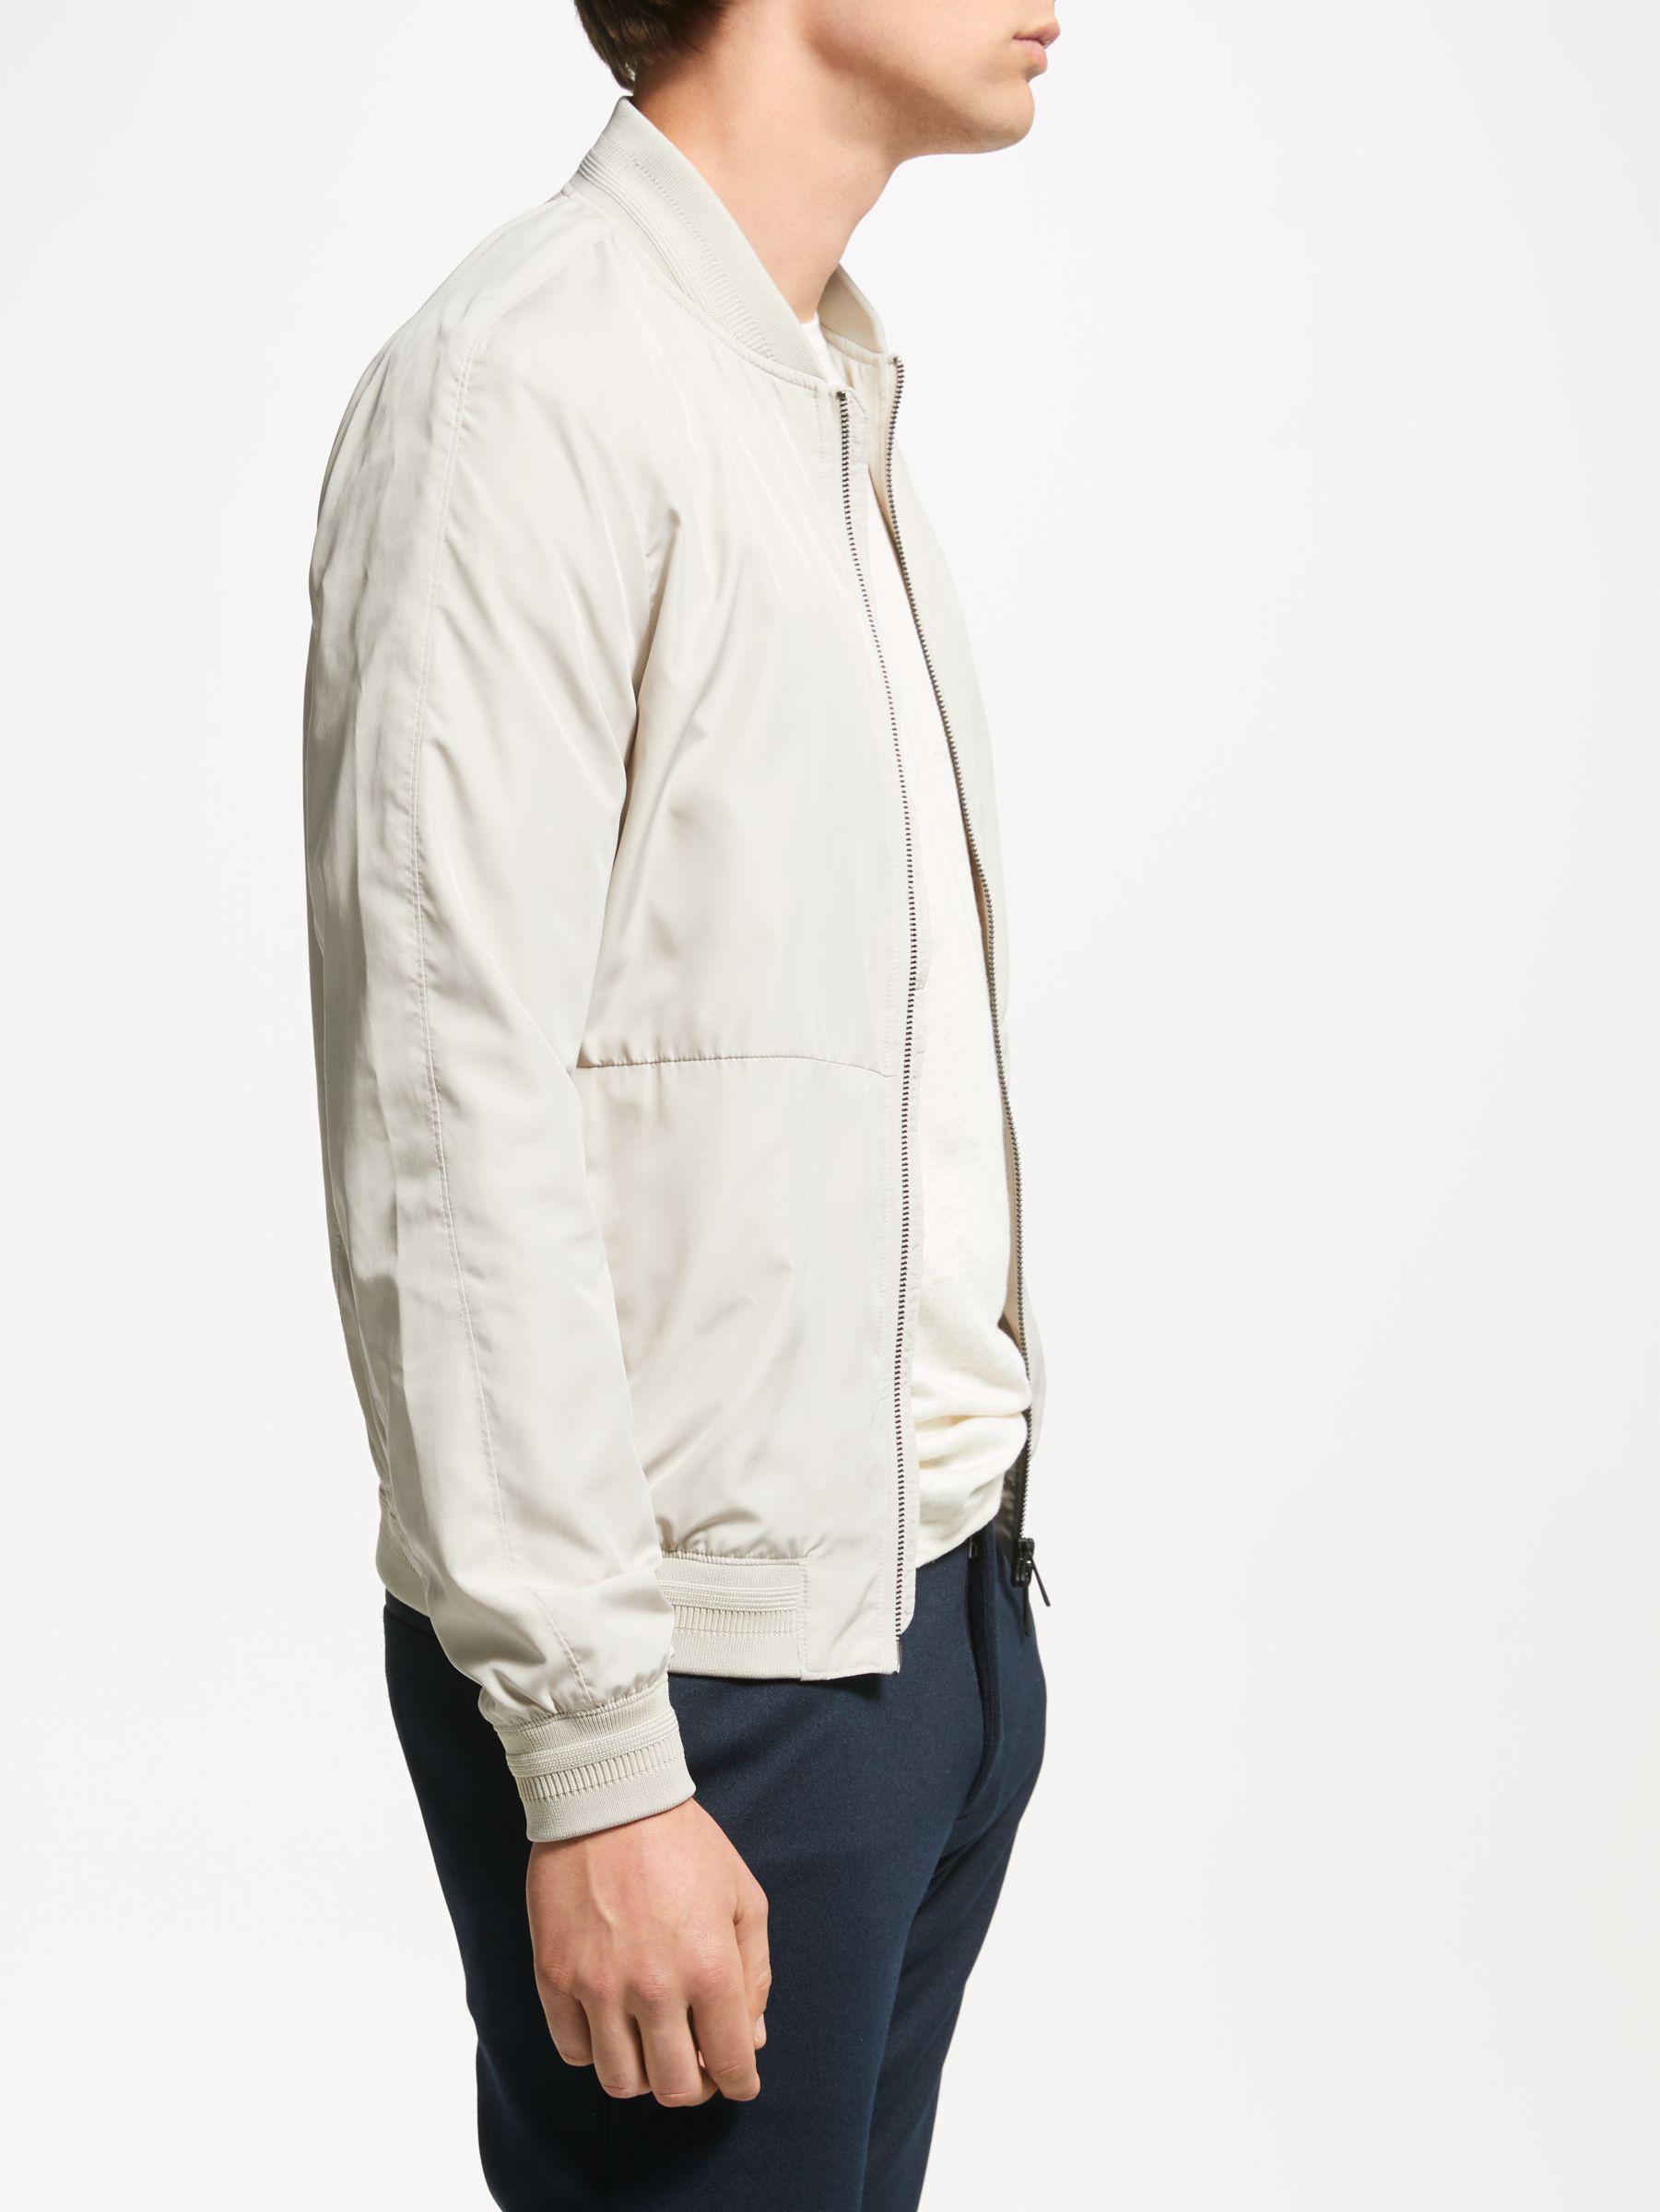 J.Lindeberg Denim Thom Bomber Jacket in White for Men